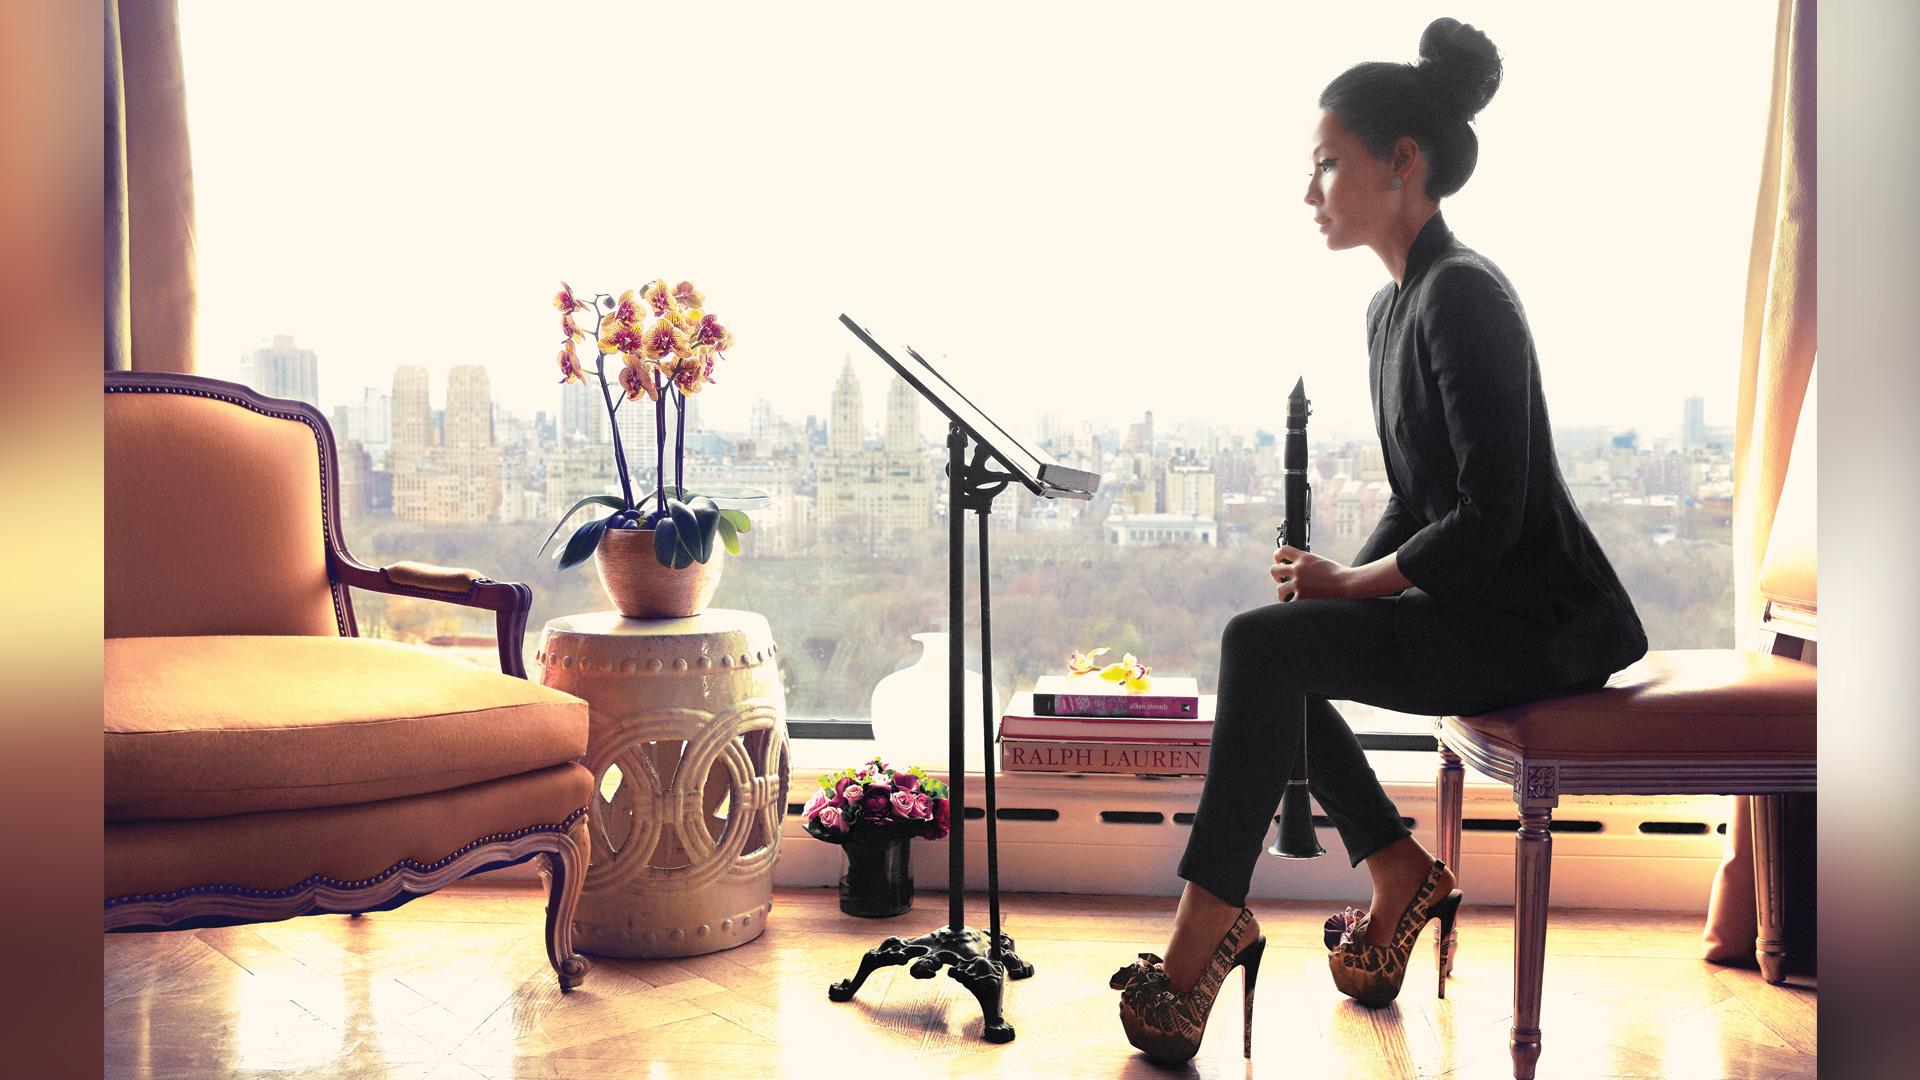 Lucy Liu has a delicate beauty